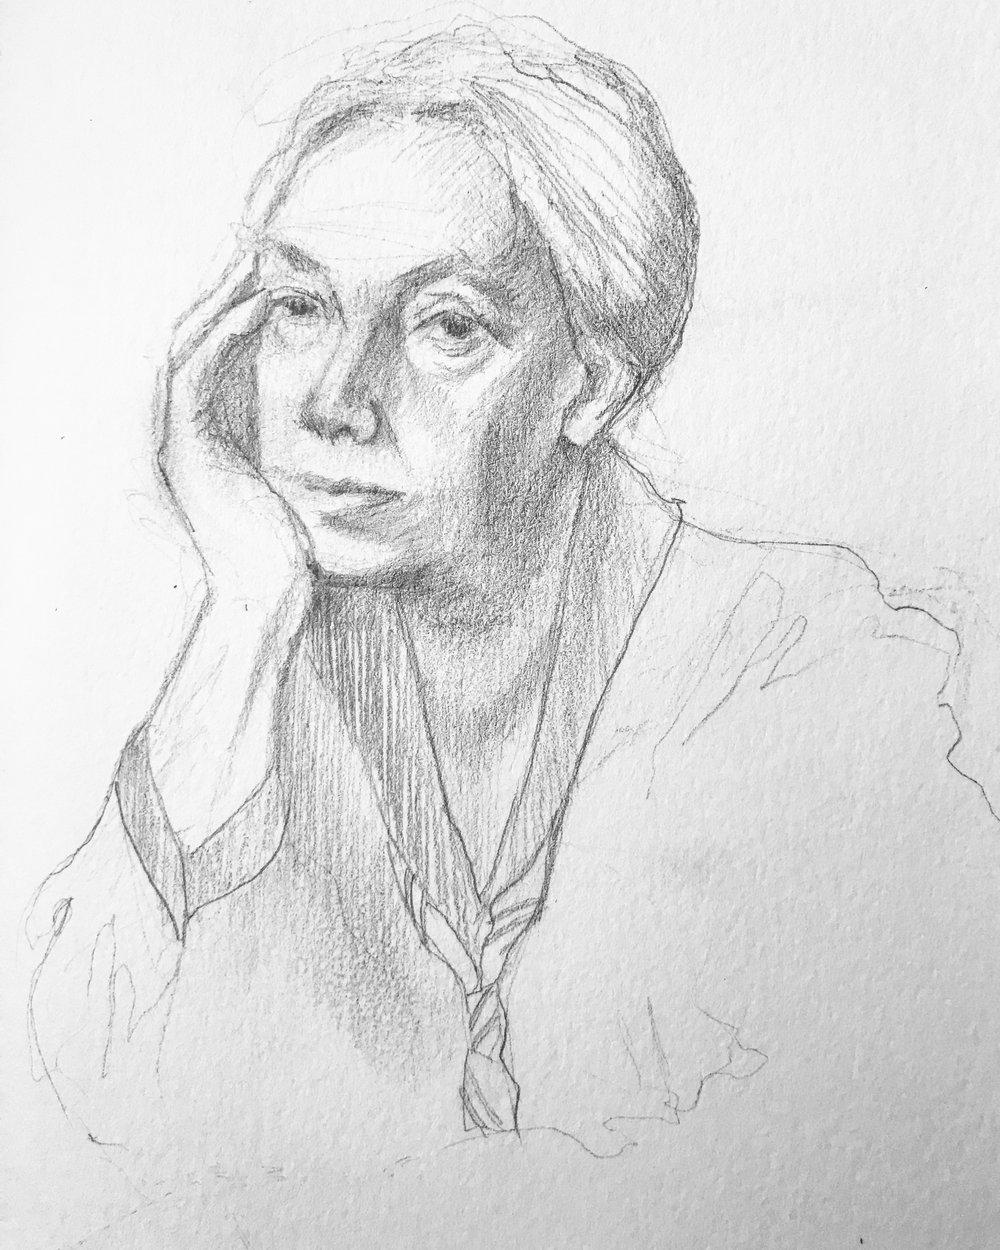 My sensitive sketch of Kathe Kollwitz.